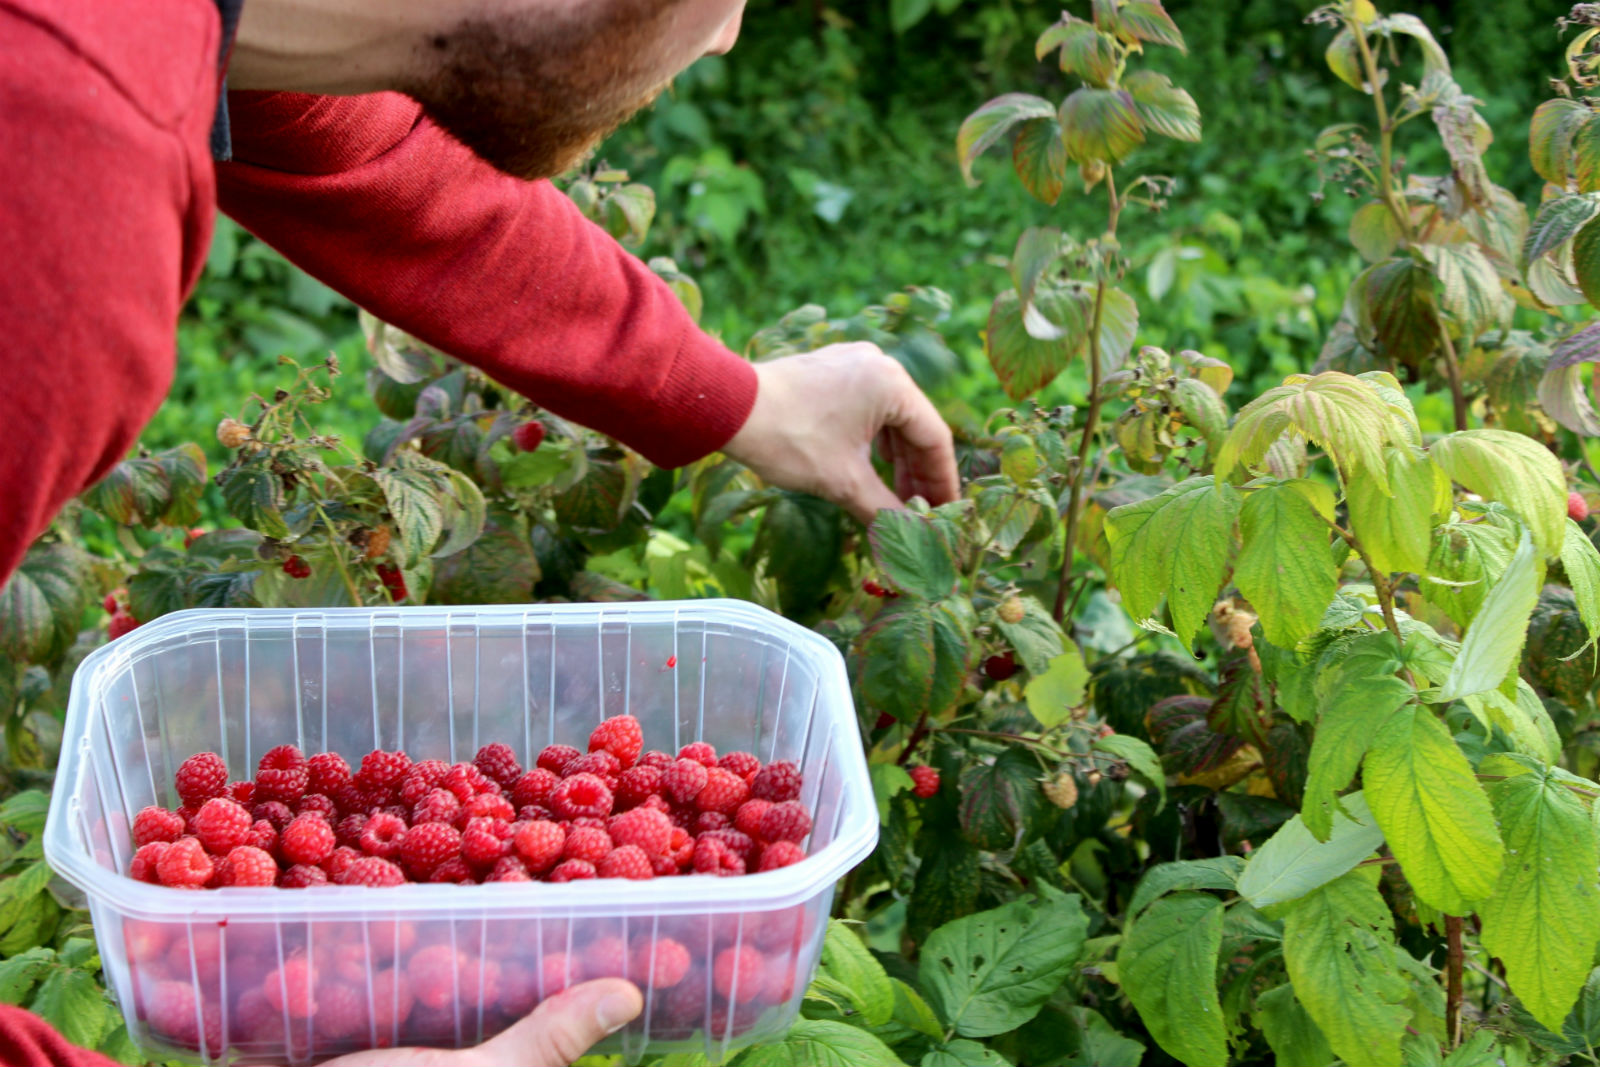 HiP Paris blog. Cueillette de Gally. Picking raspberries